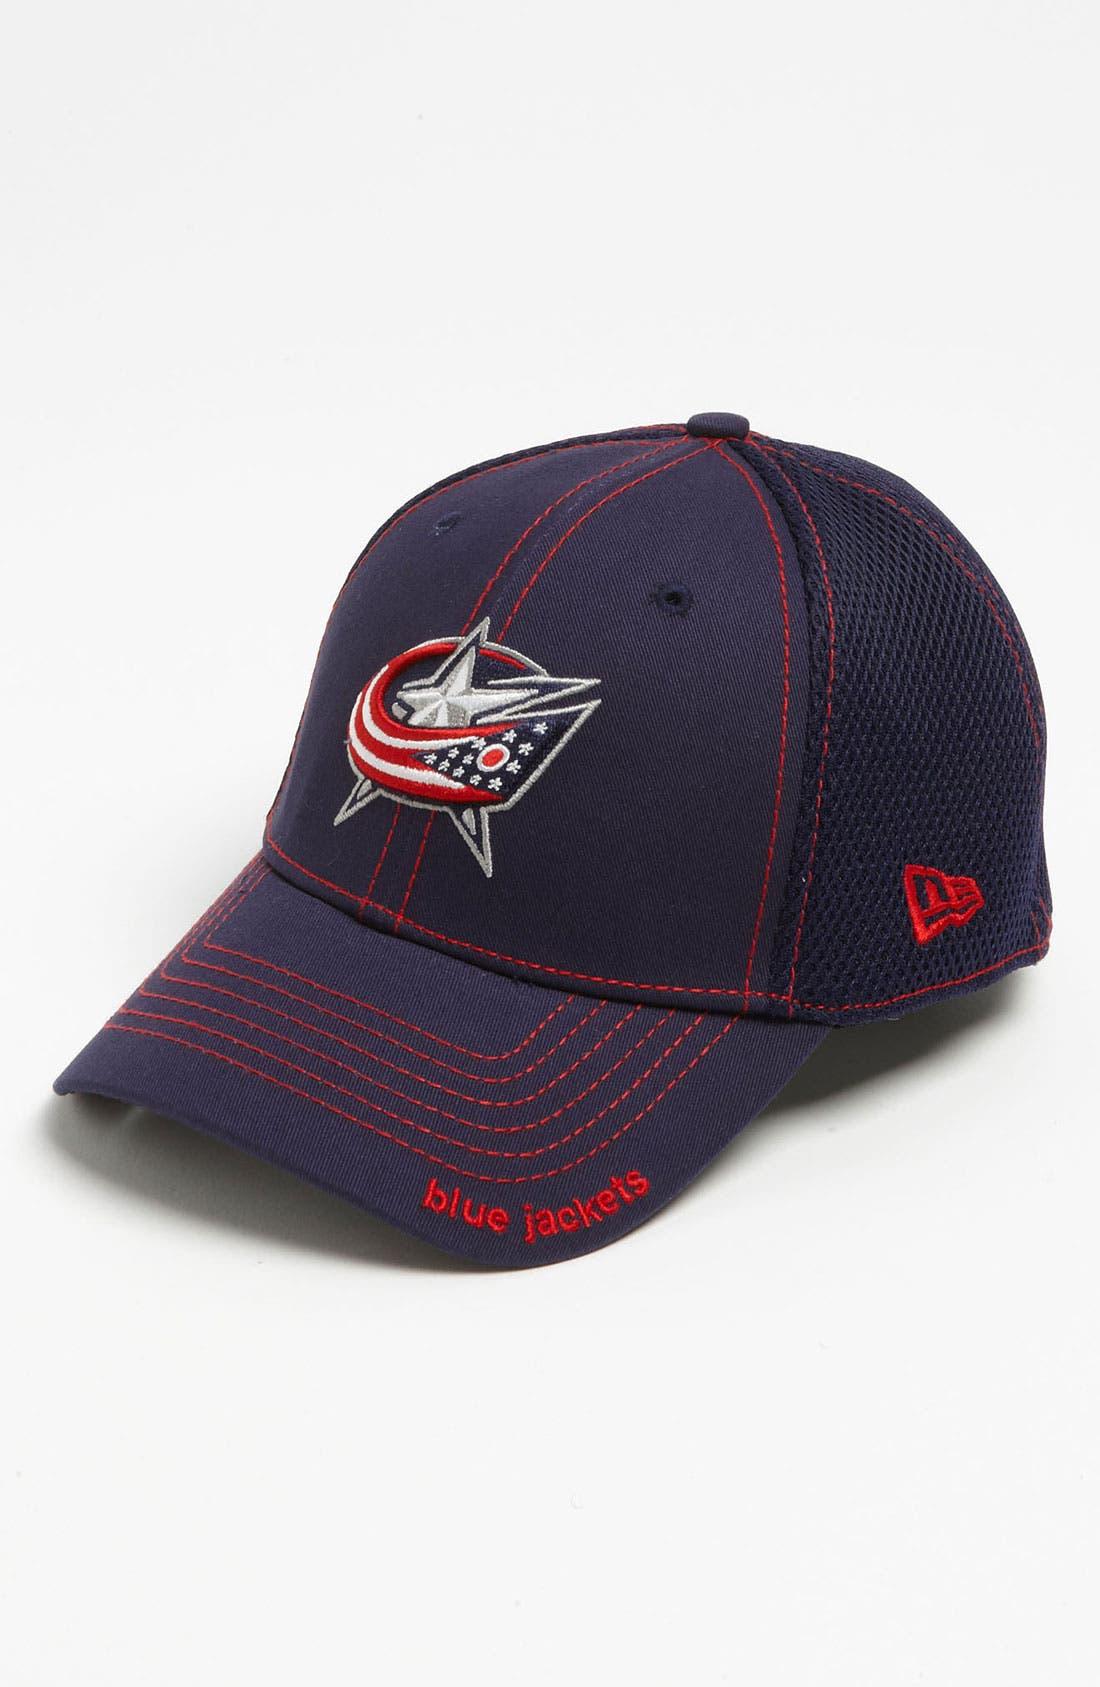 'Neo - Columbus Blue Jackets' Baseball Cap,                             Main thumbnail 1, color,                             401